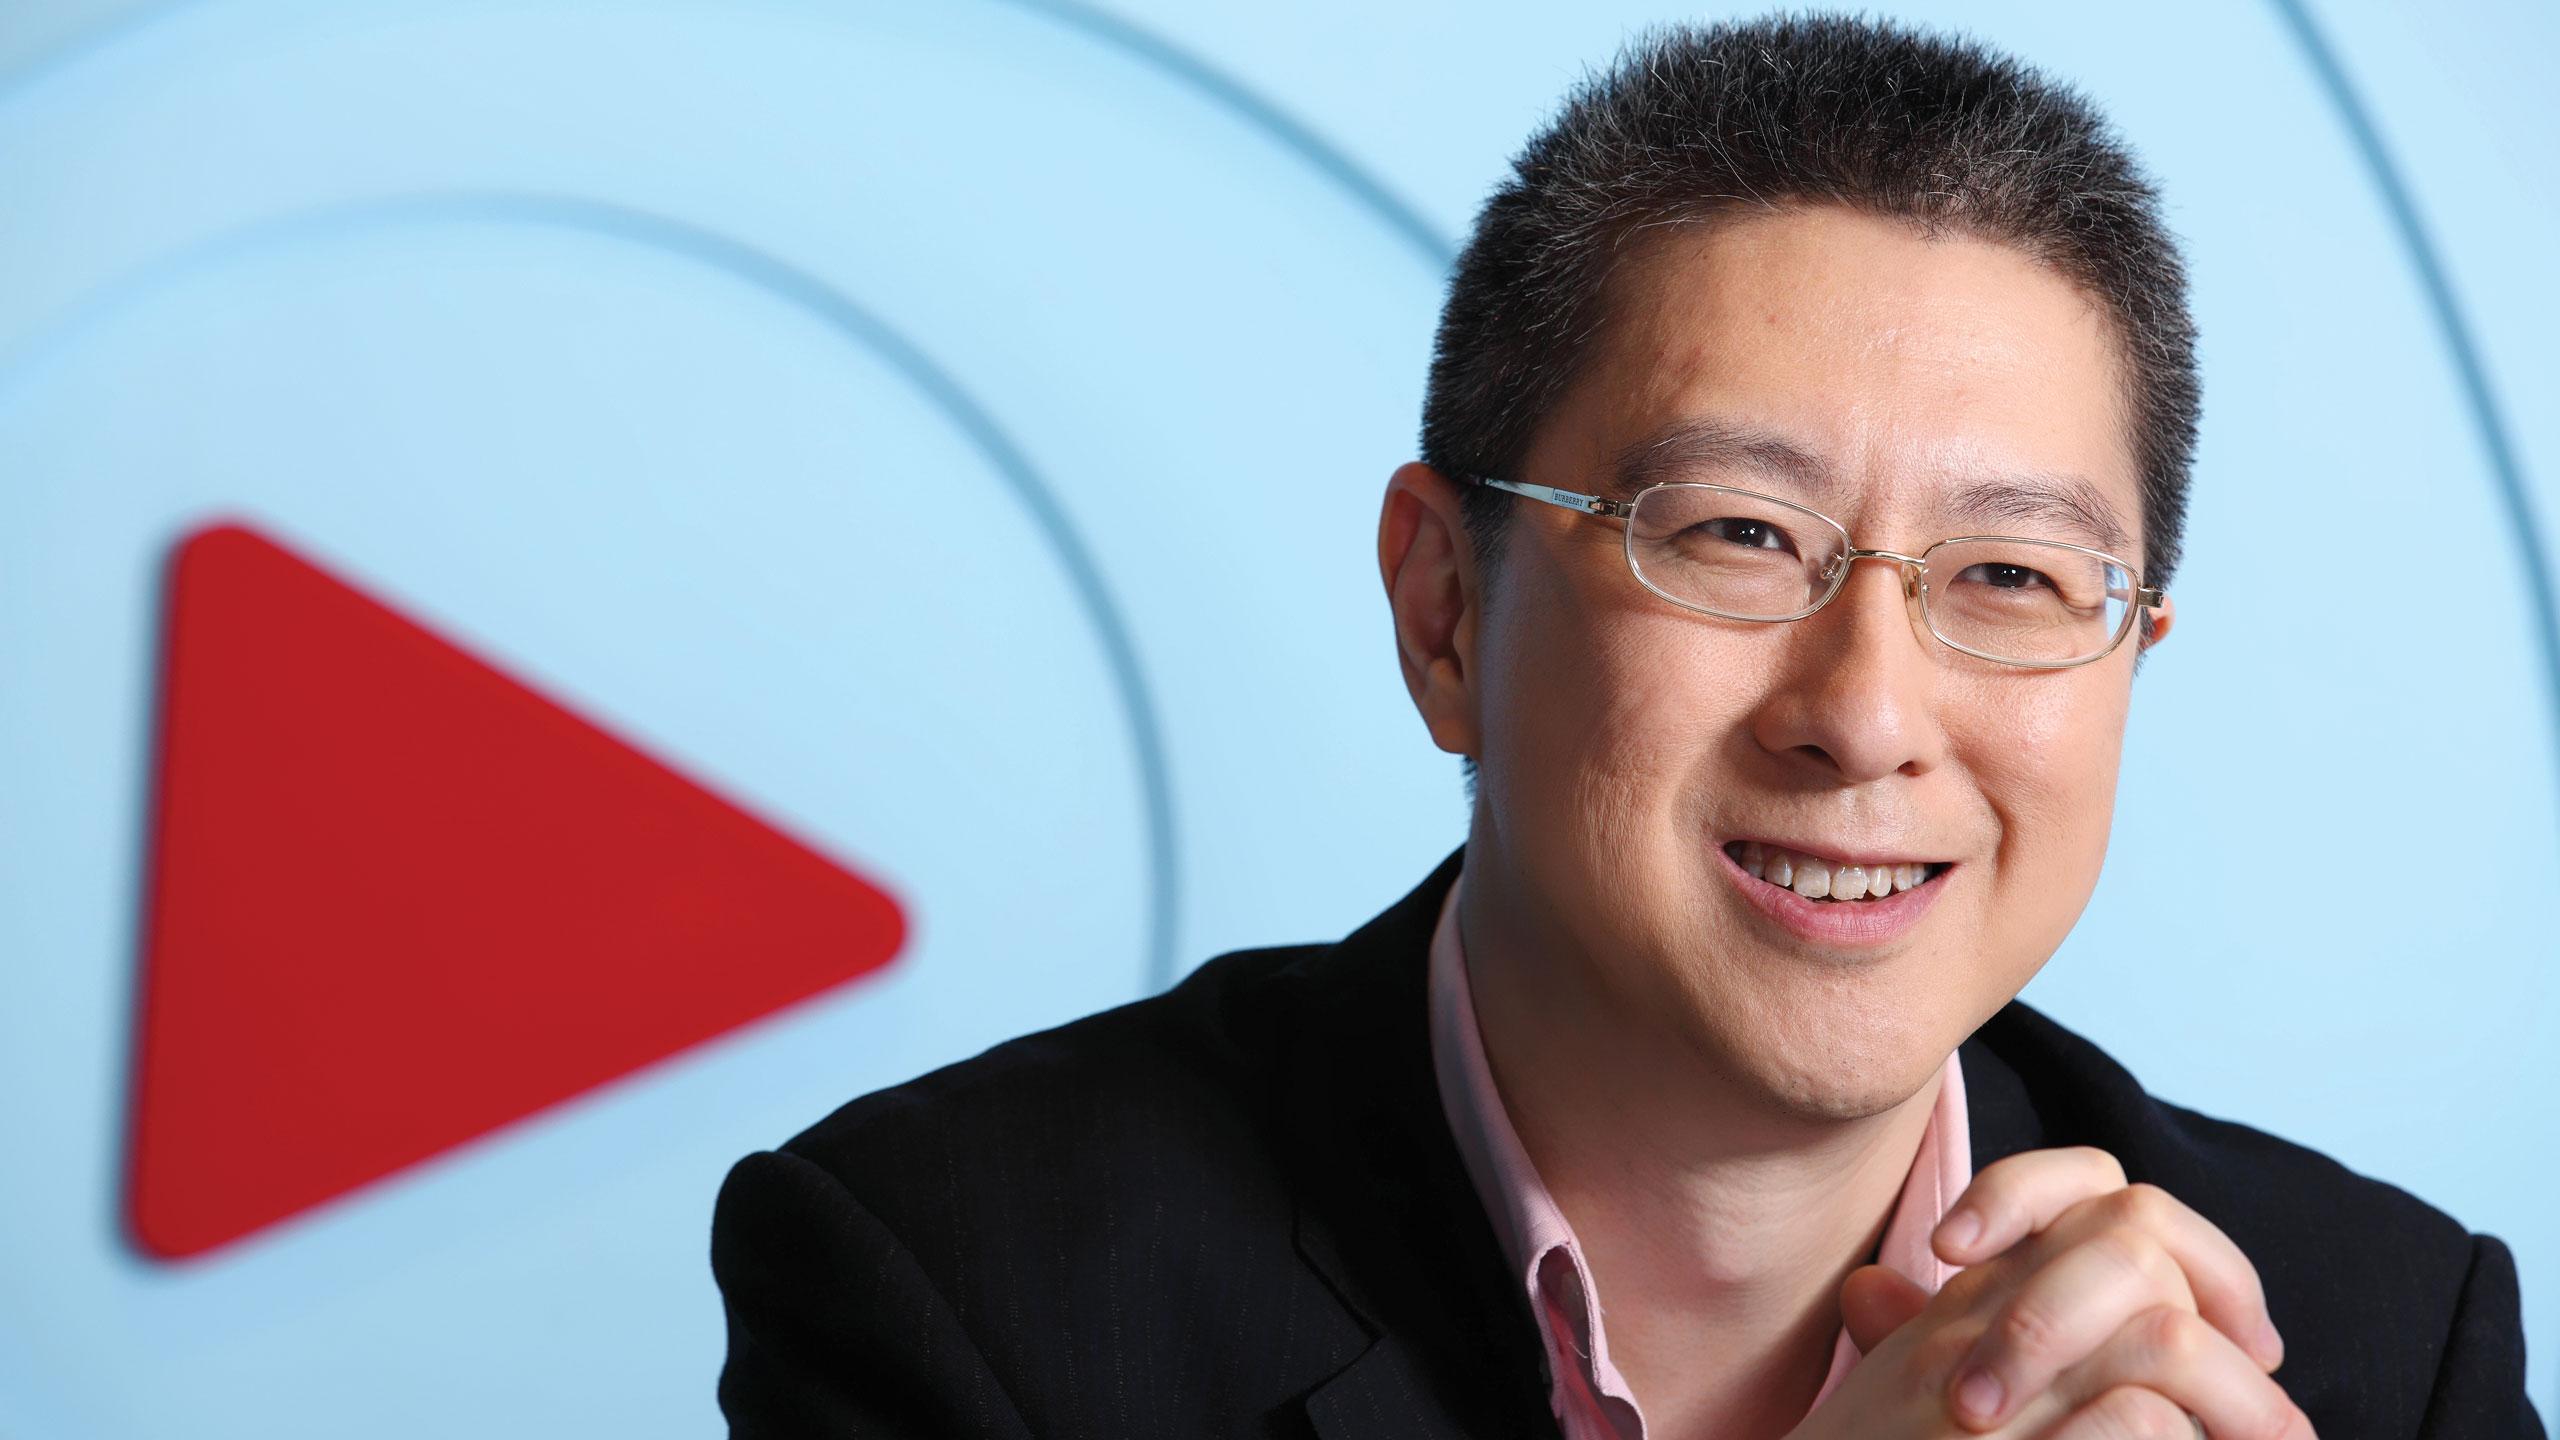 Youku Tudou CEO Victor Koo Talks Streaming Company's Cross-Platform Plans